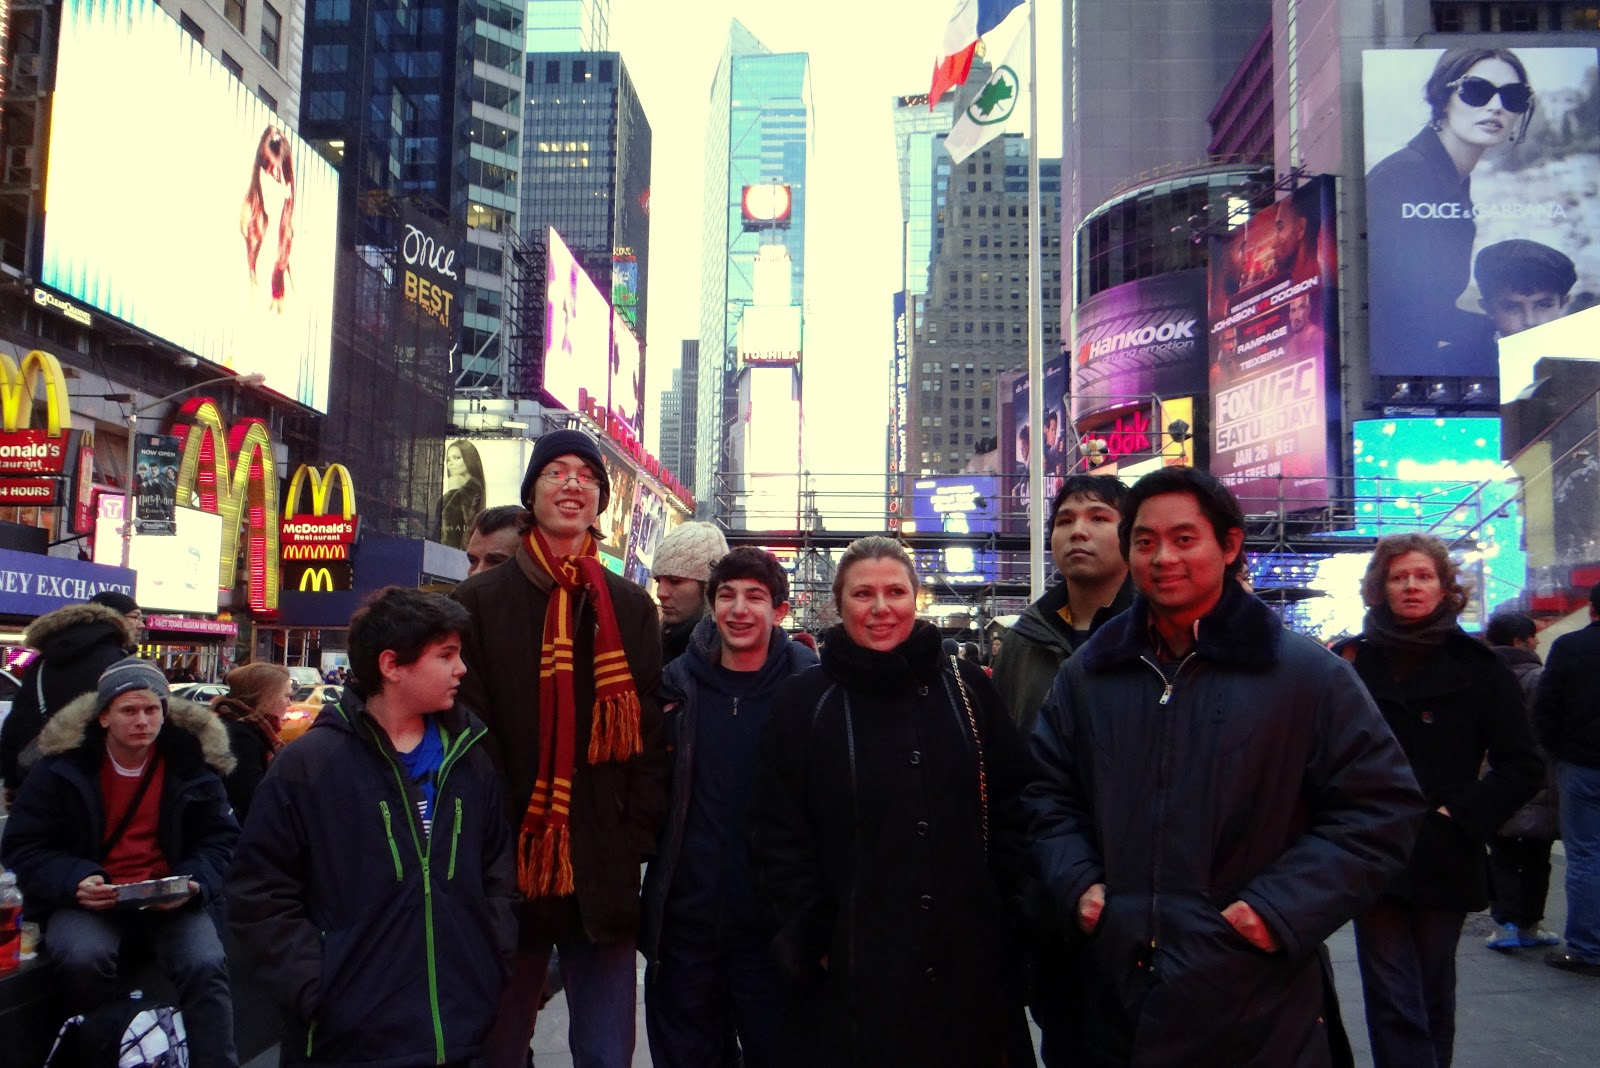 Webster University chess team members in New York